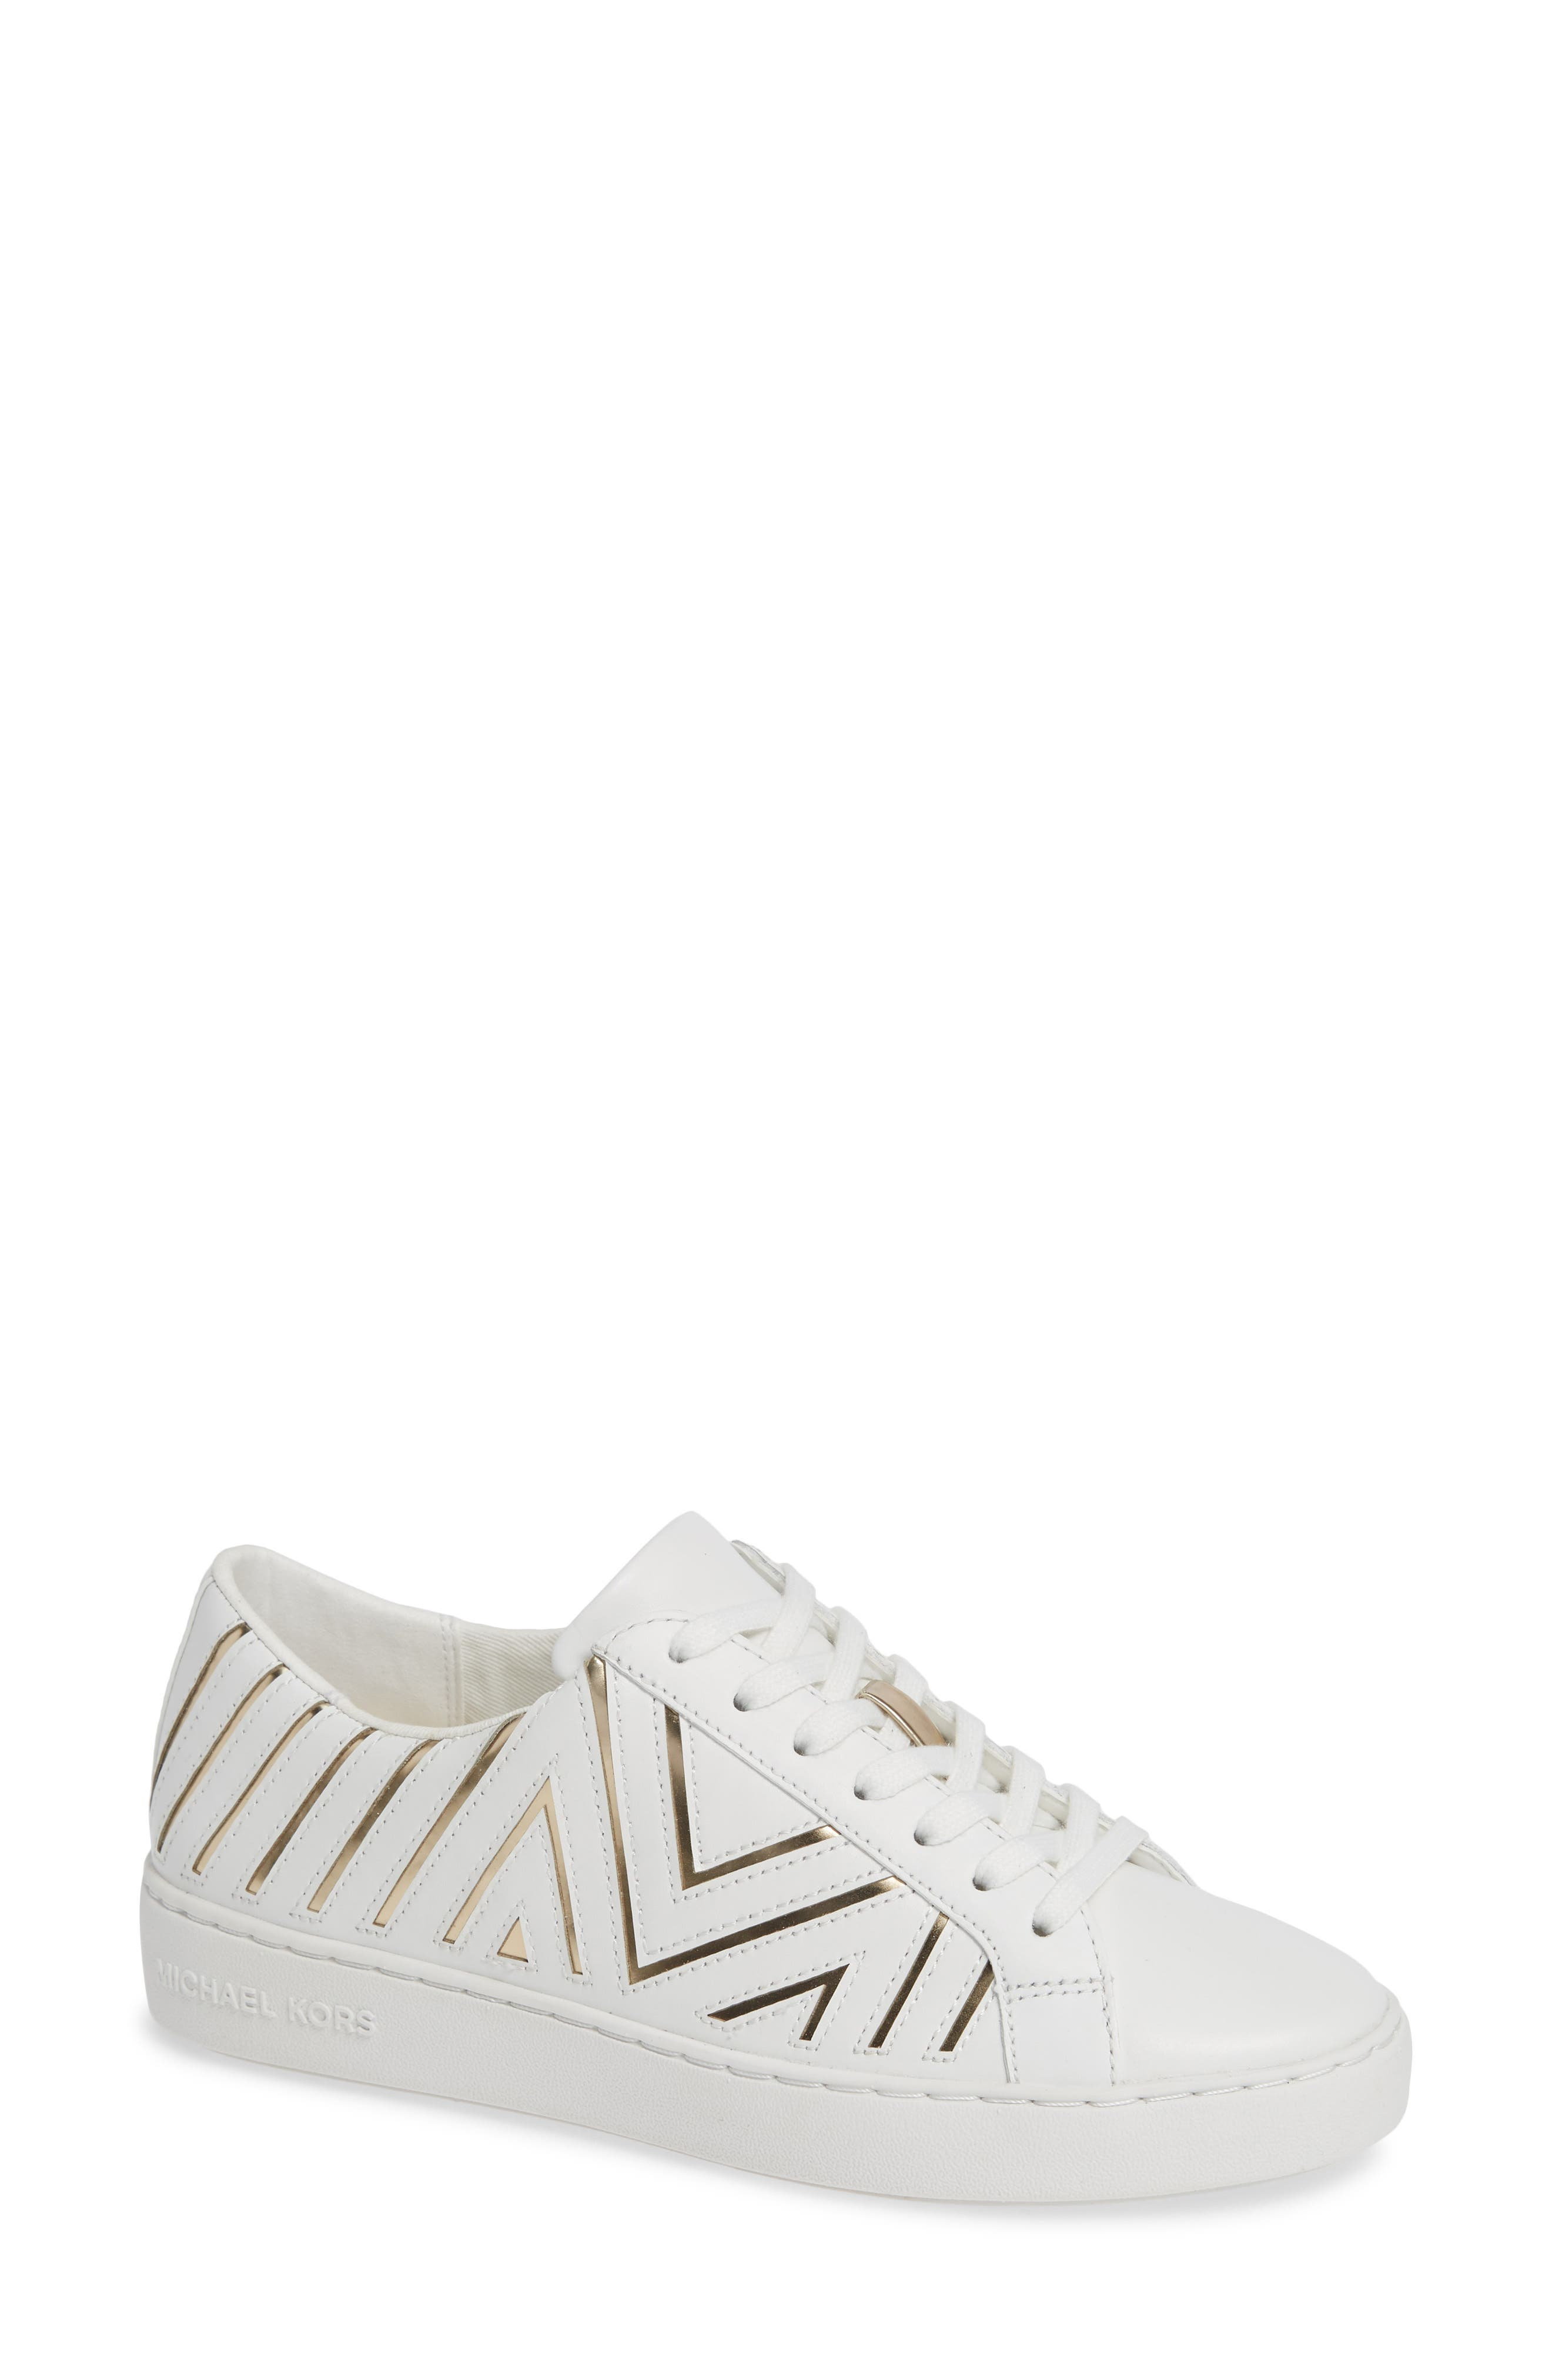 MICHAEL MICHAEL KORS Whitney Sneaker, Main, color, 100